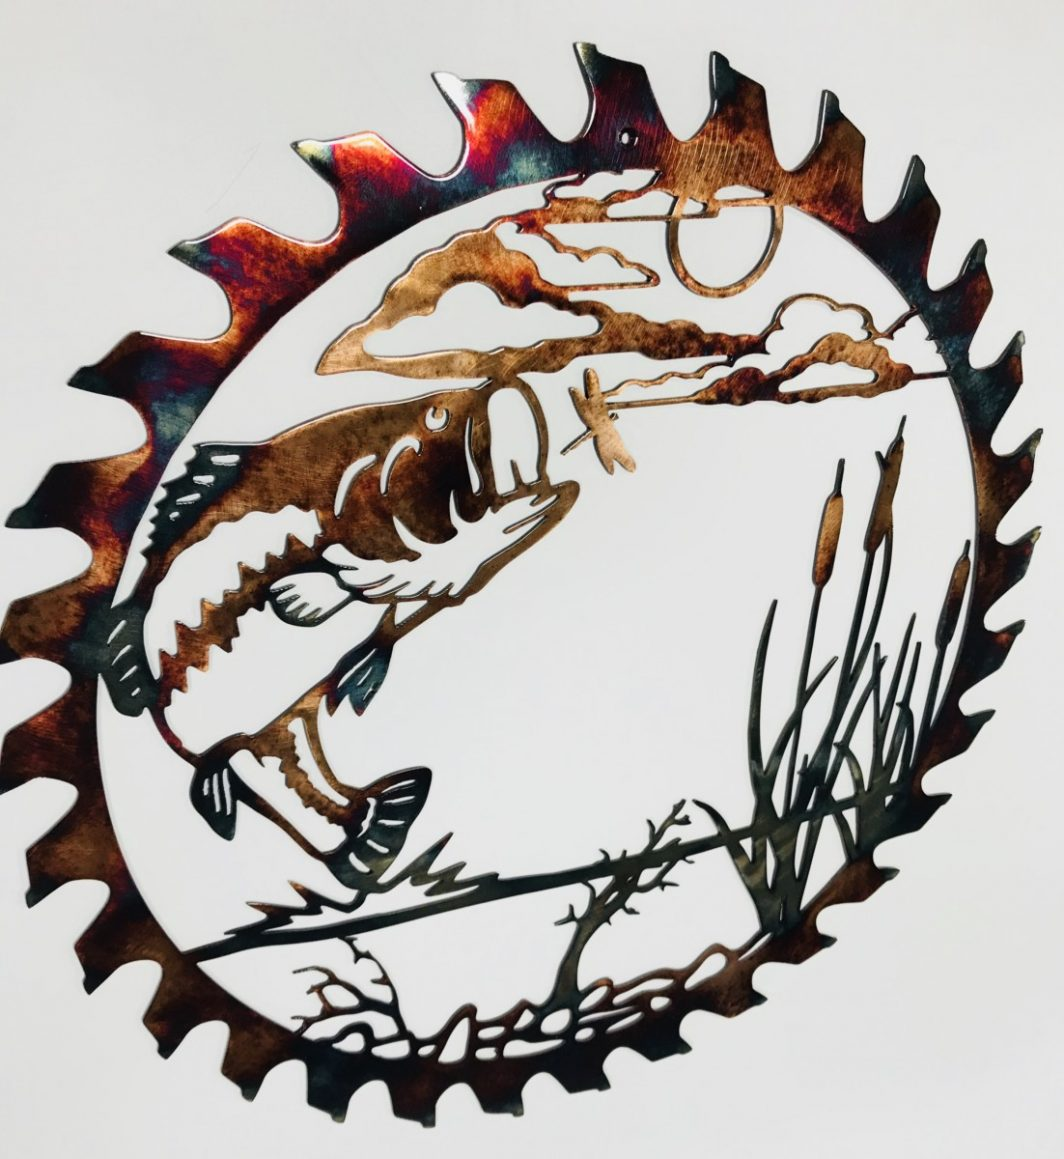 04 bass attack sawblade cut out Metal Wall Art Metal Dècor Studios